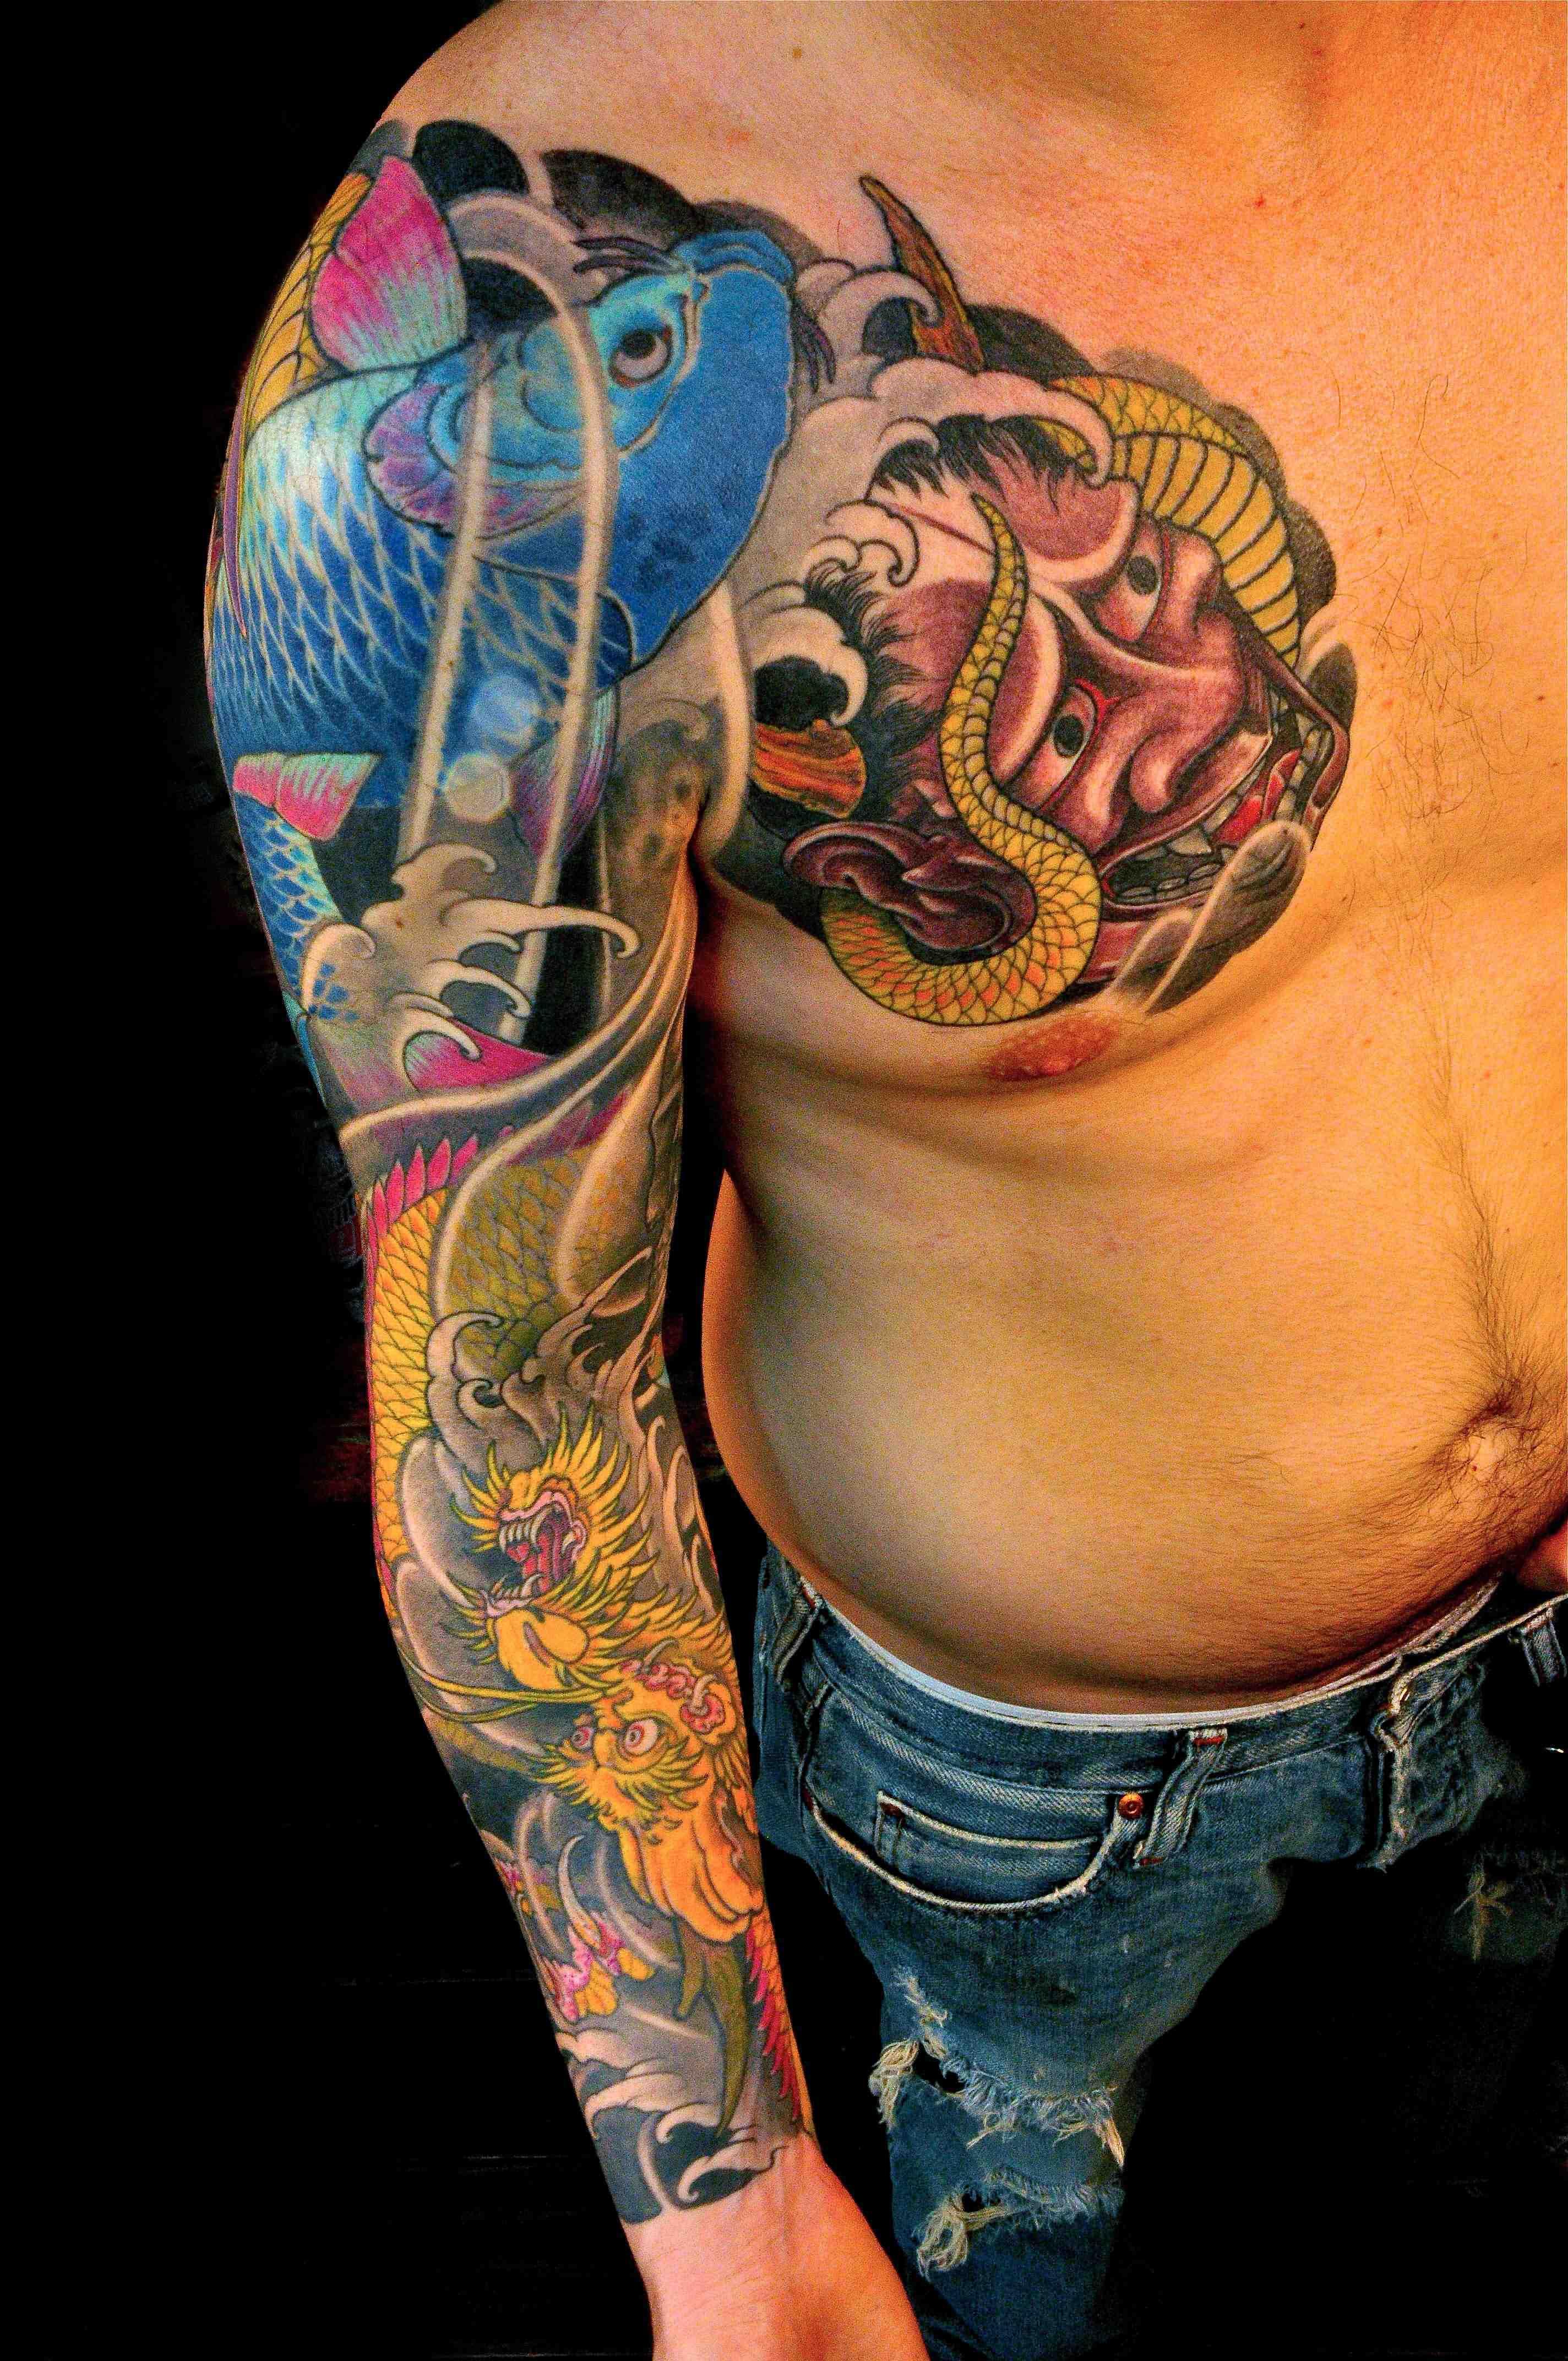 Chris Nunez Tattoo On Chest And Right Sleeve